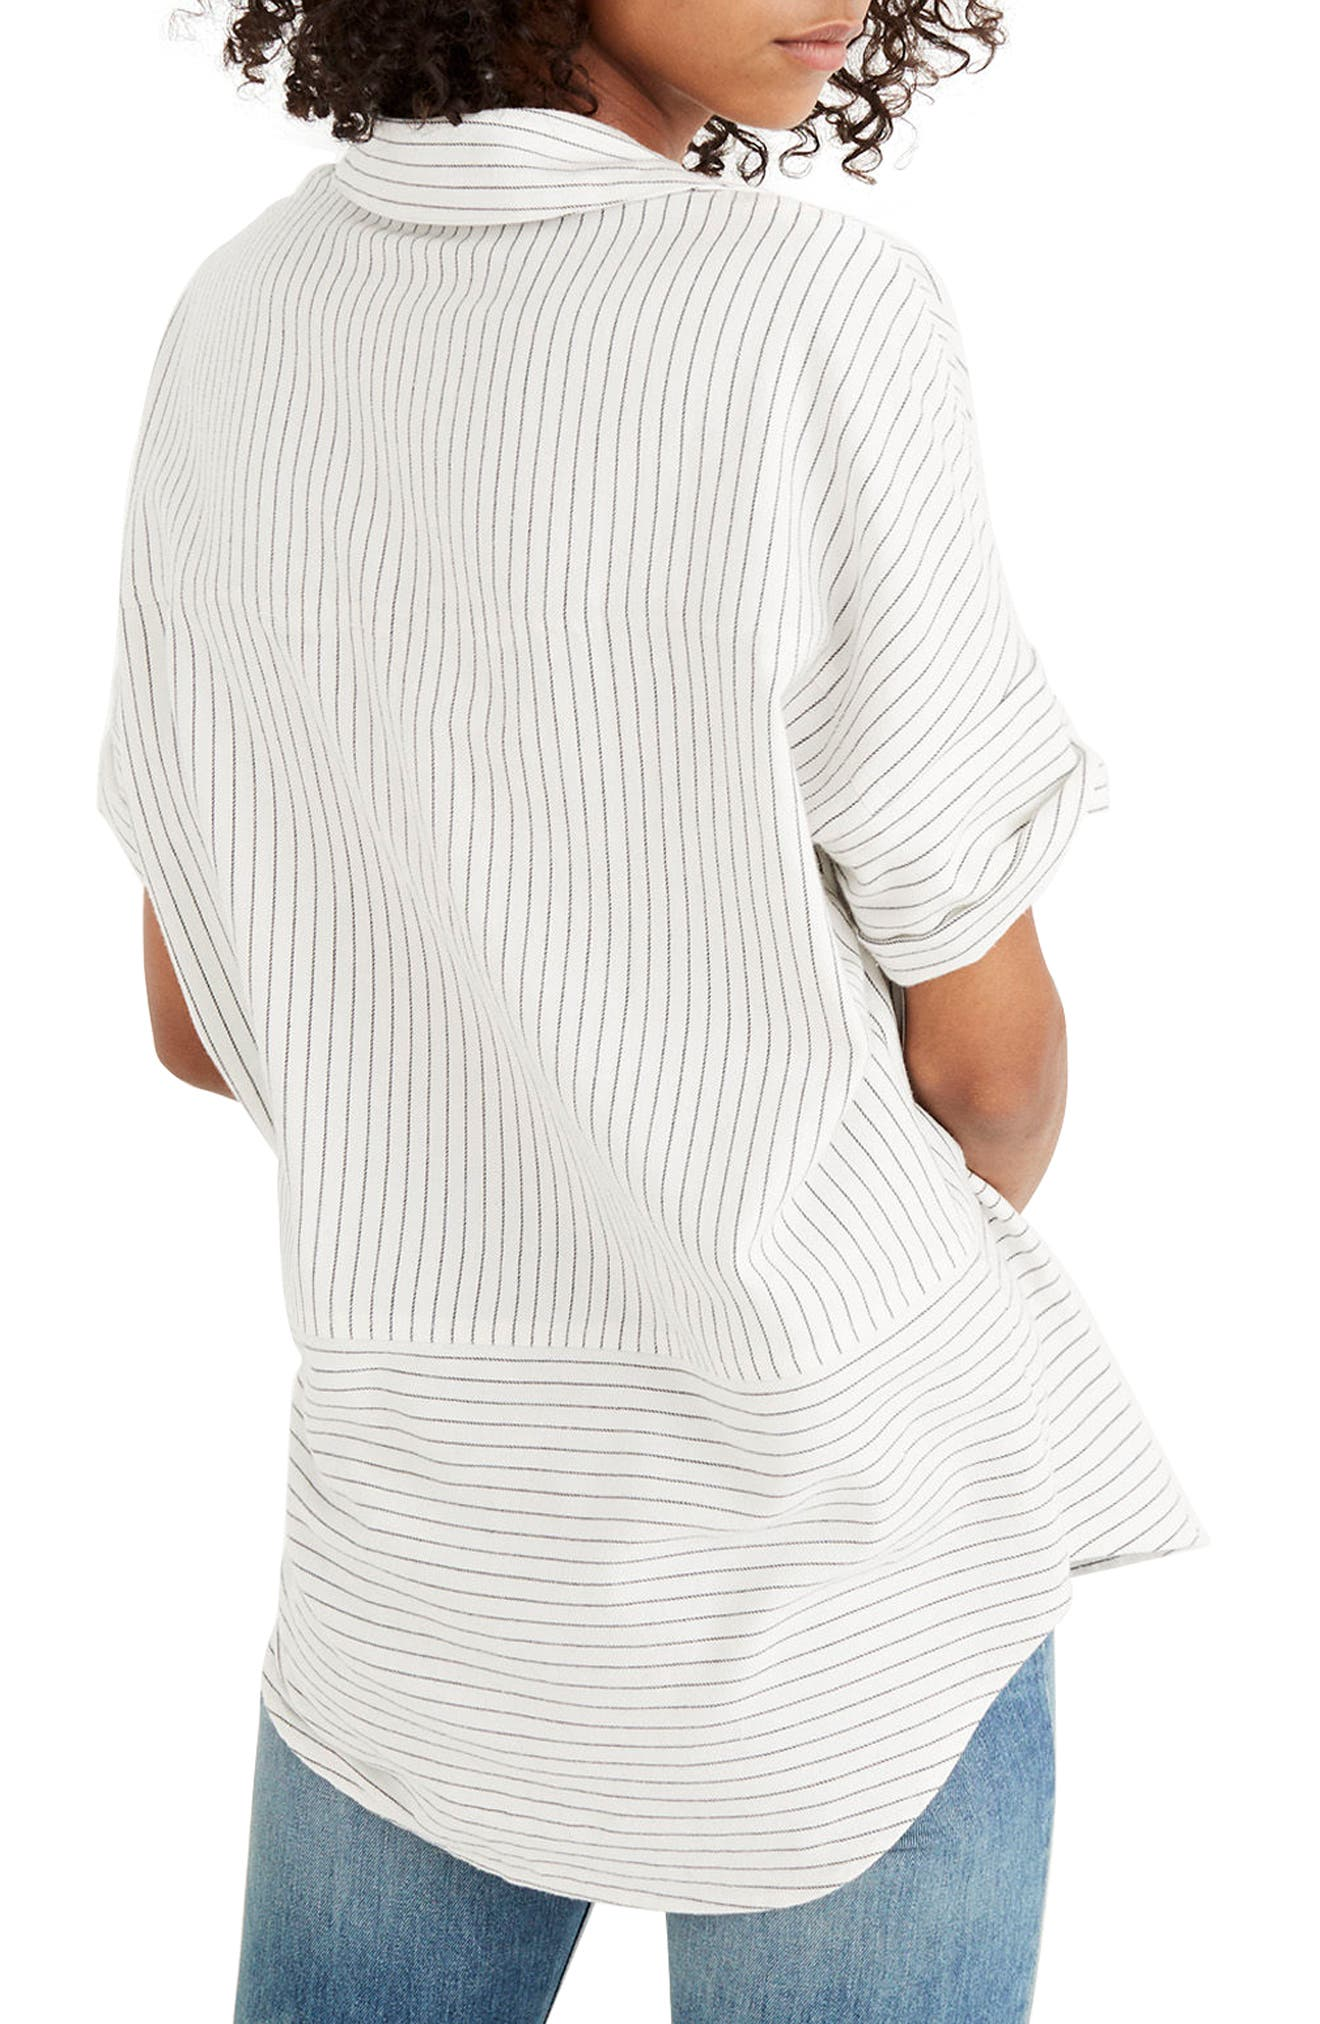 Flannel Courier Shirt,                             Alternate thumbnail 2, color,                             Bright Ivory Jones Stripe